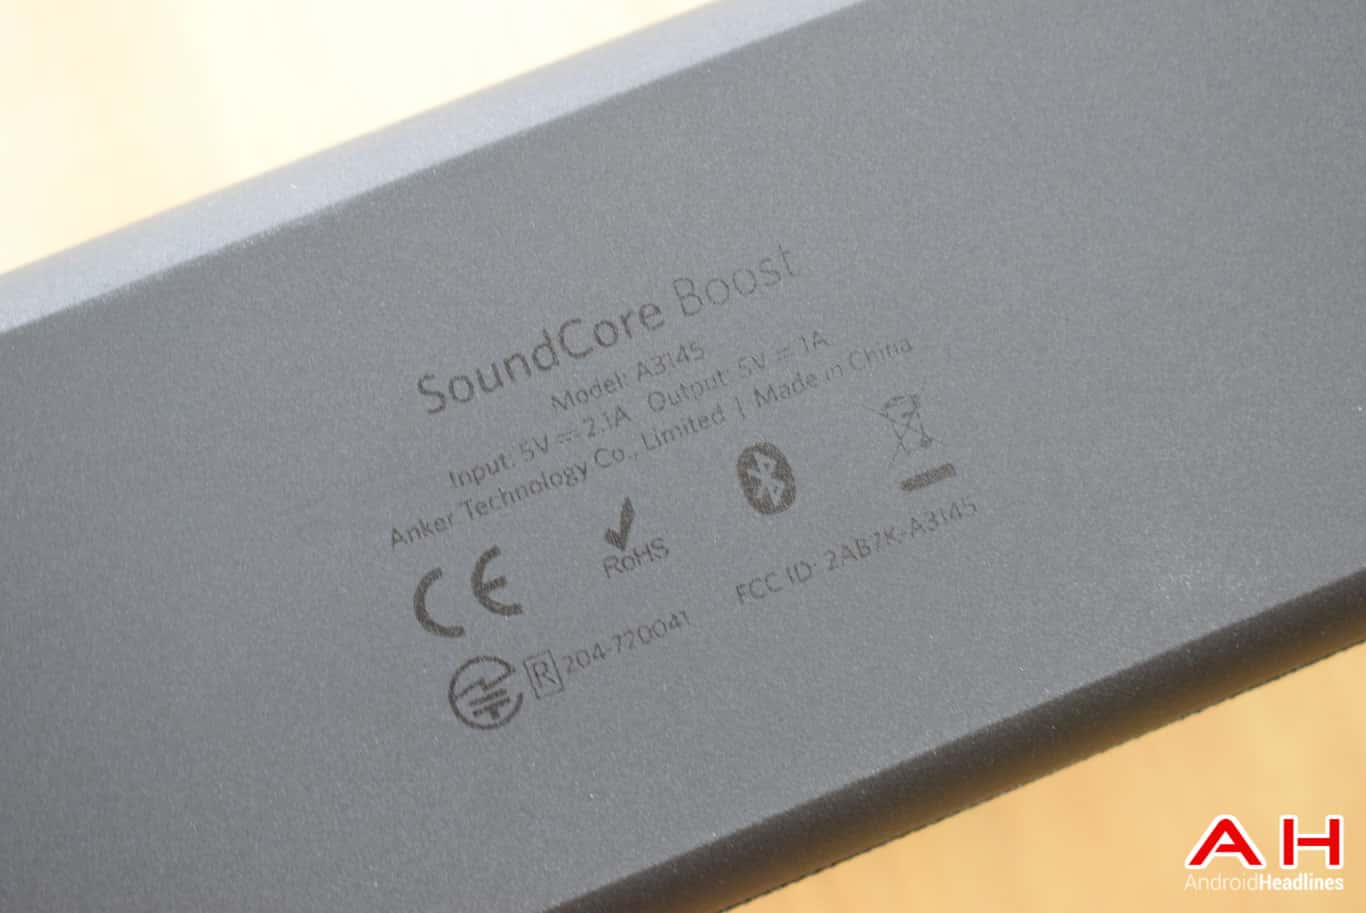 Anker SoundCore Boost AM AH 11